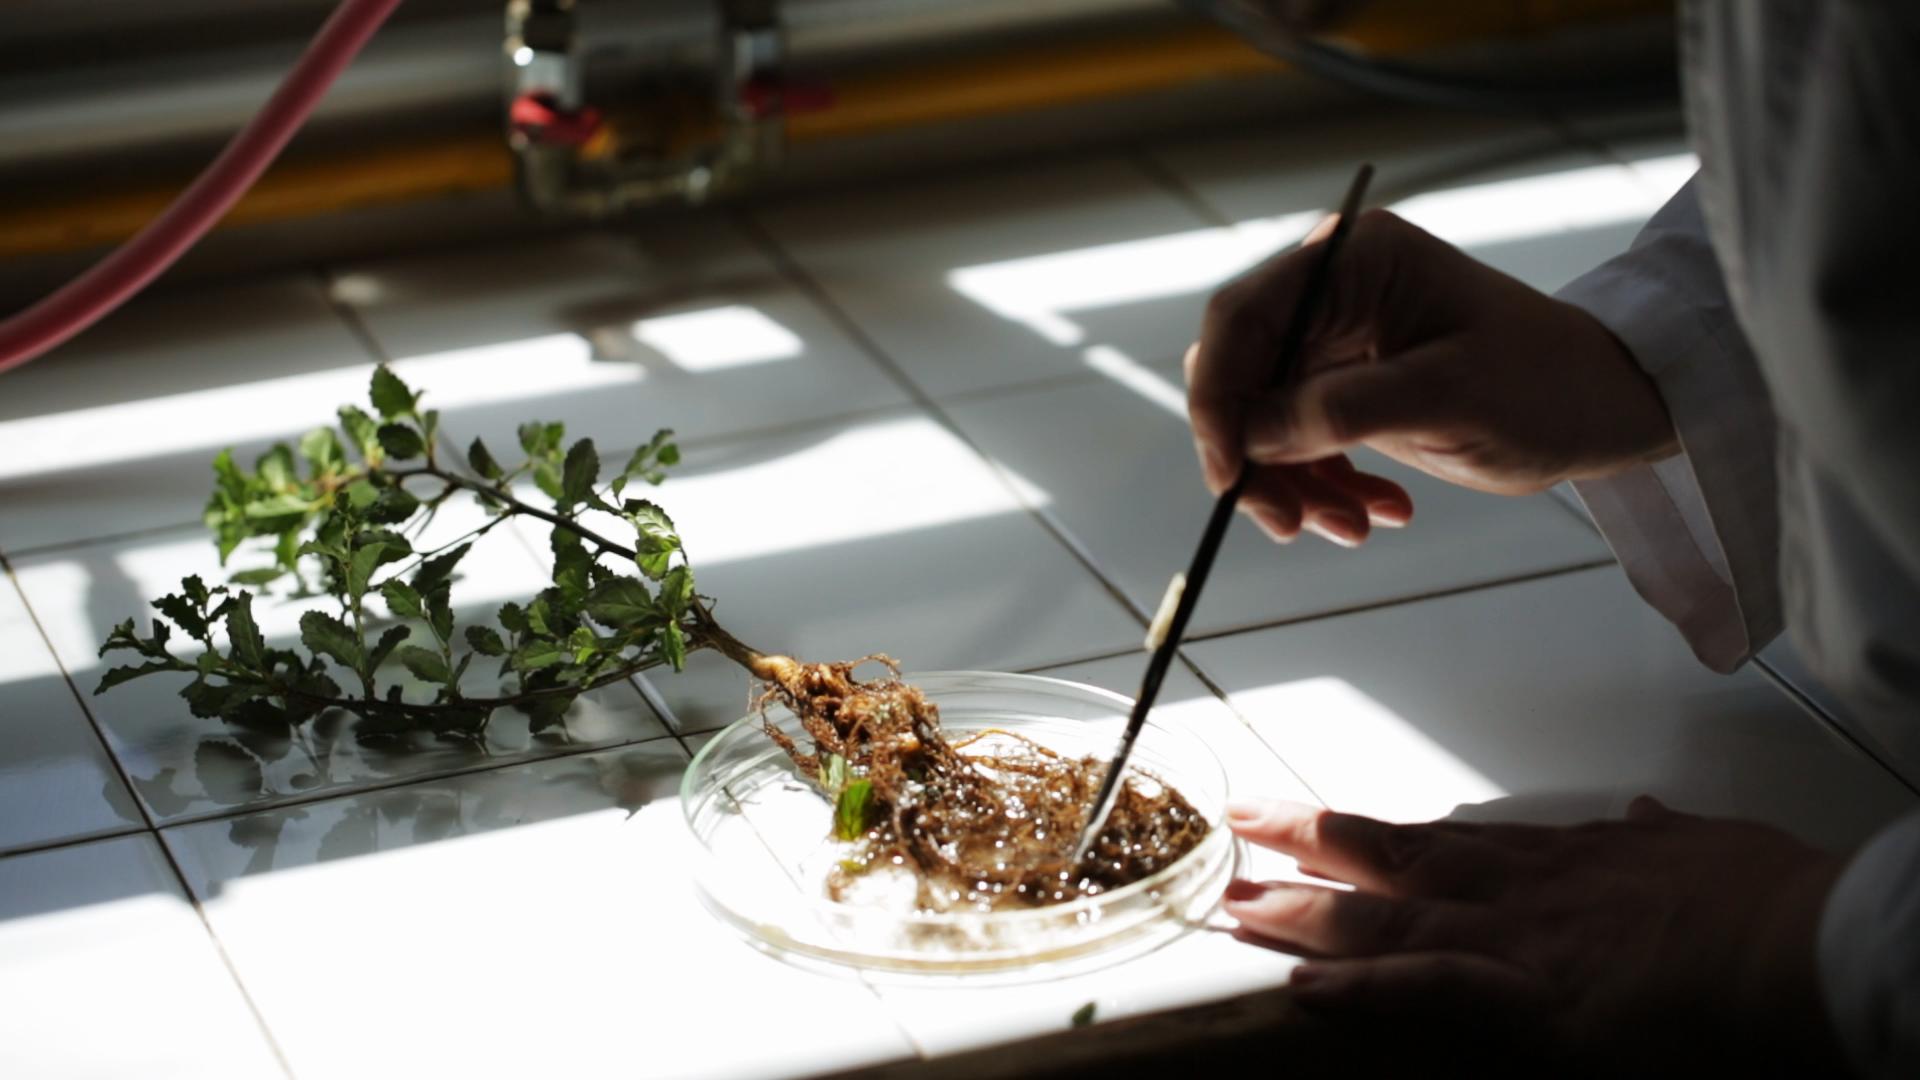 Selección-de-microorganismos-para-producción-de-álamos